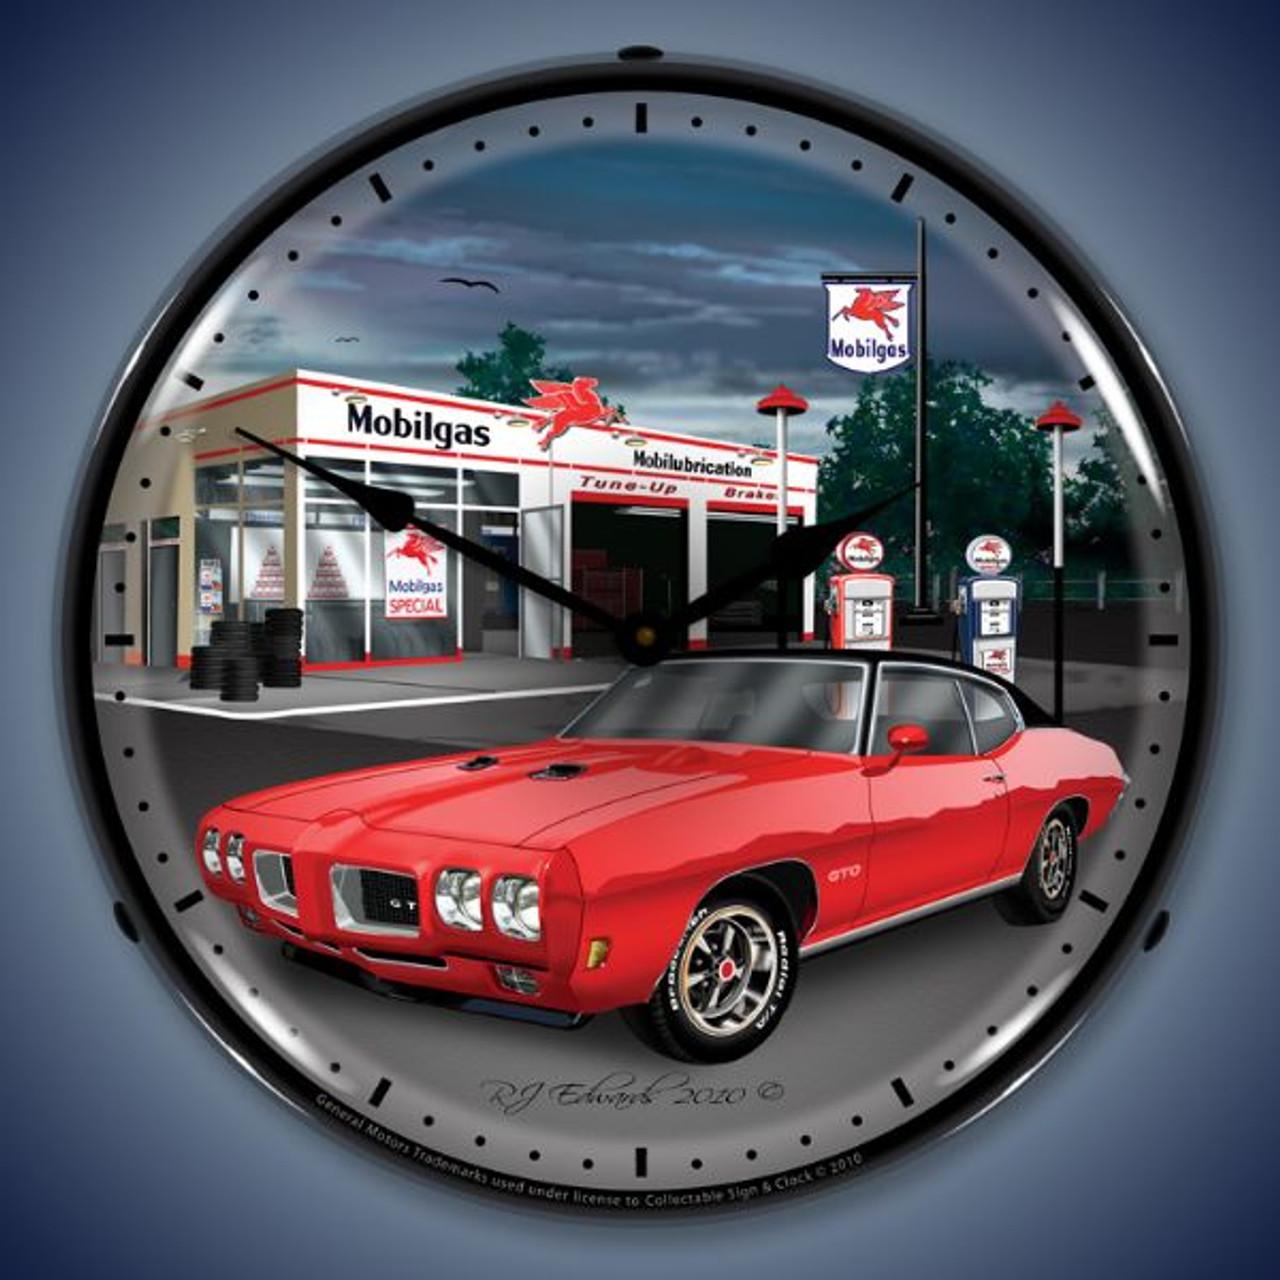 Retro  1970 GTO Mobilgas Lighted Wall Clock 14 x 14 Inches